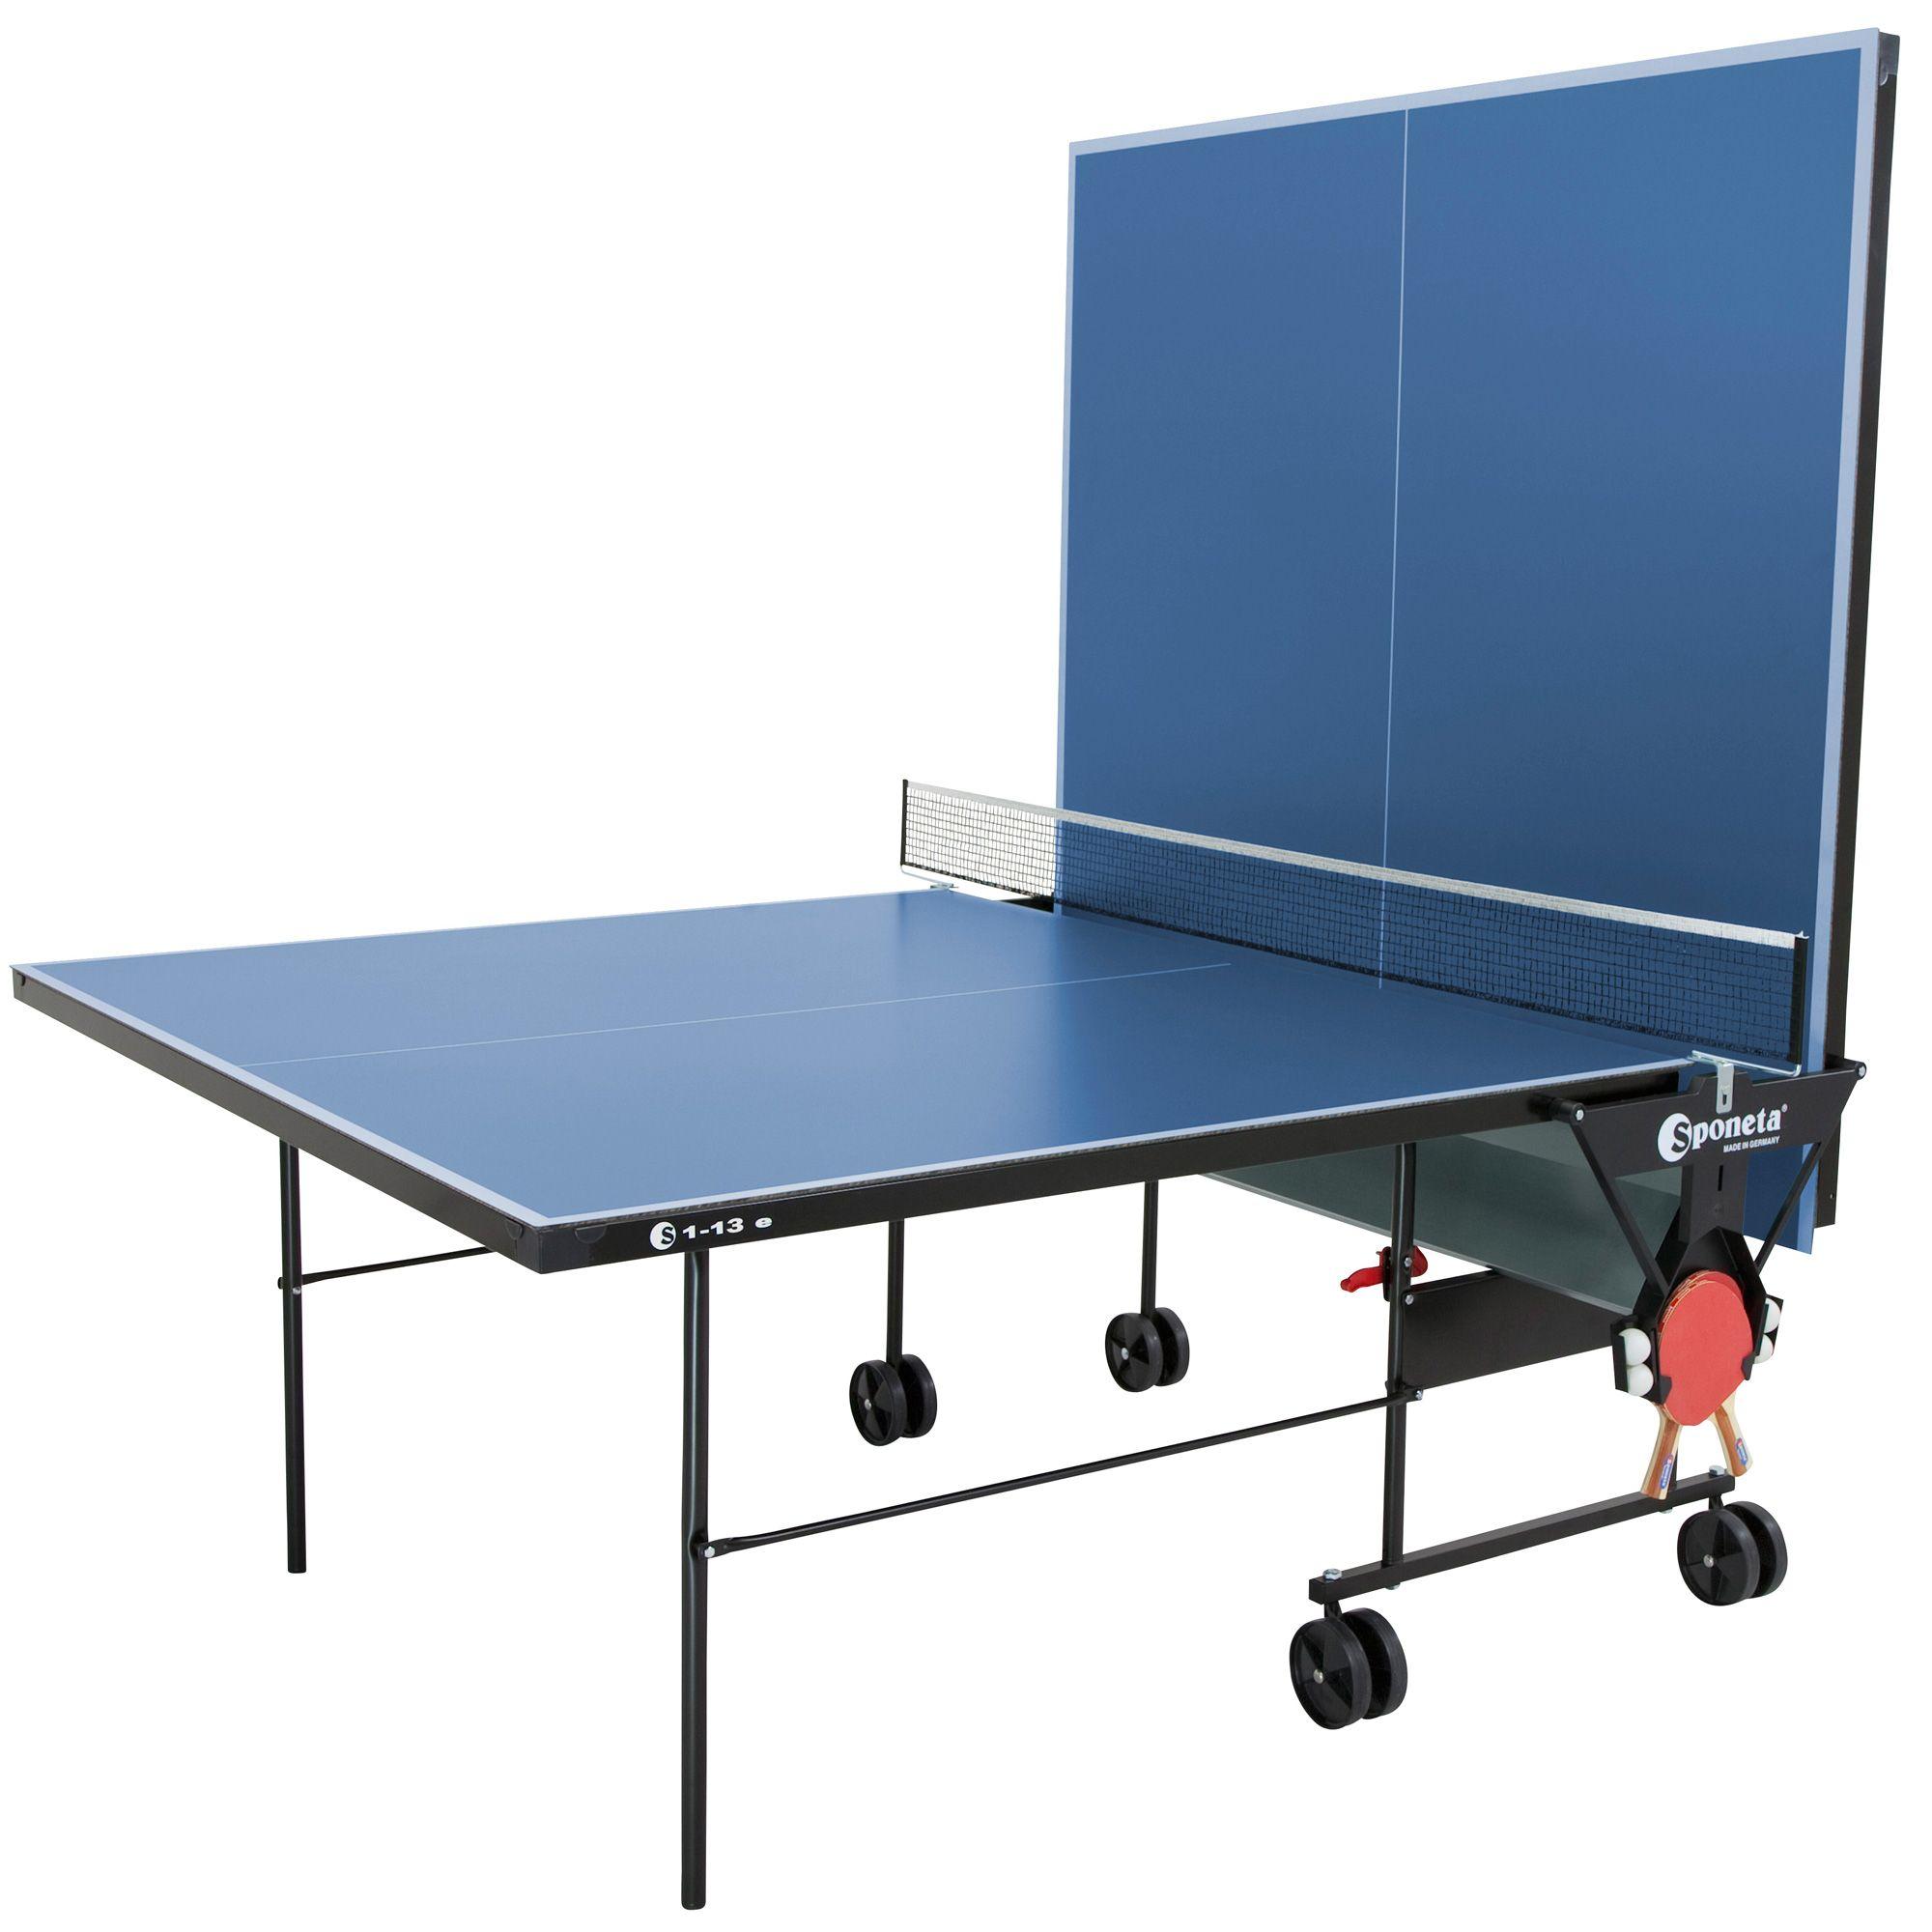 Sponeta hobbyline outdoor table tennis table - Weatherproof table tennis table ...